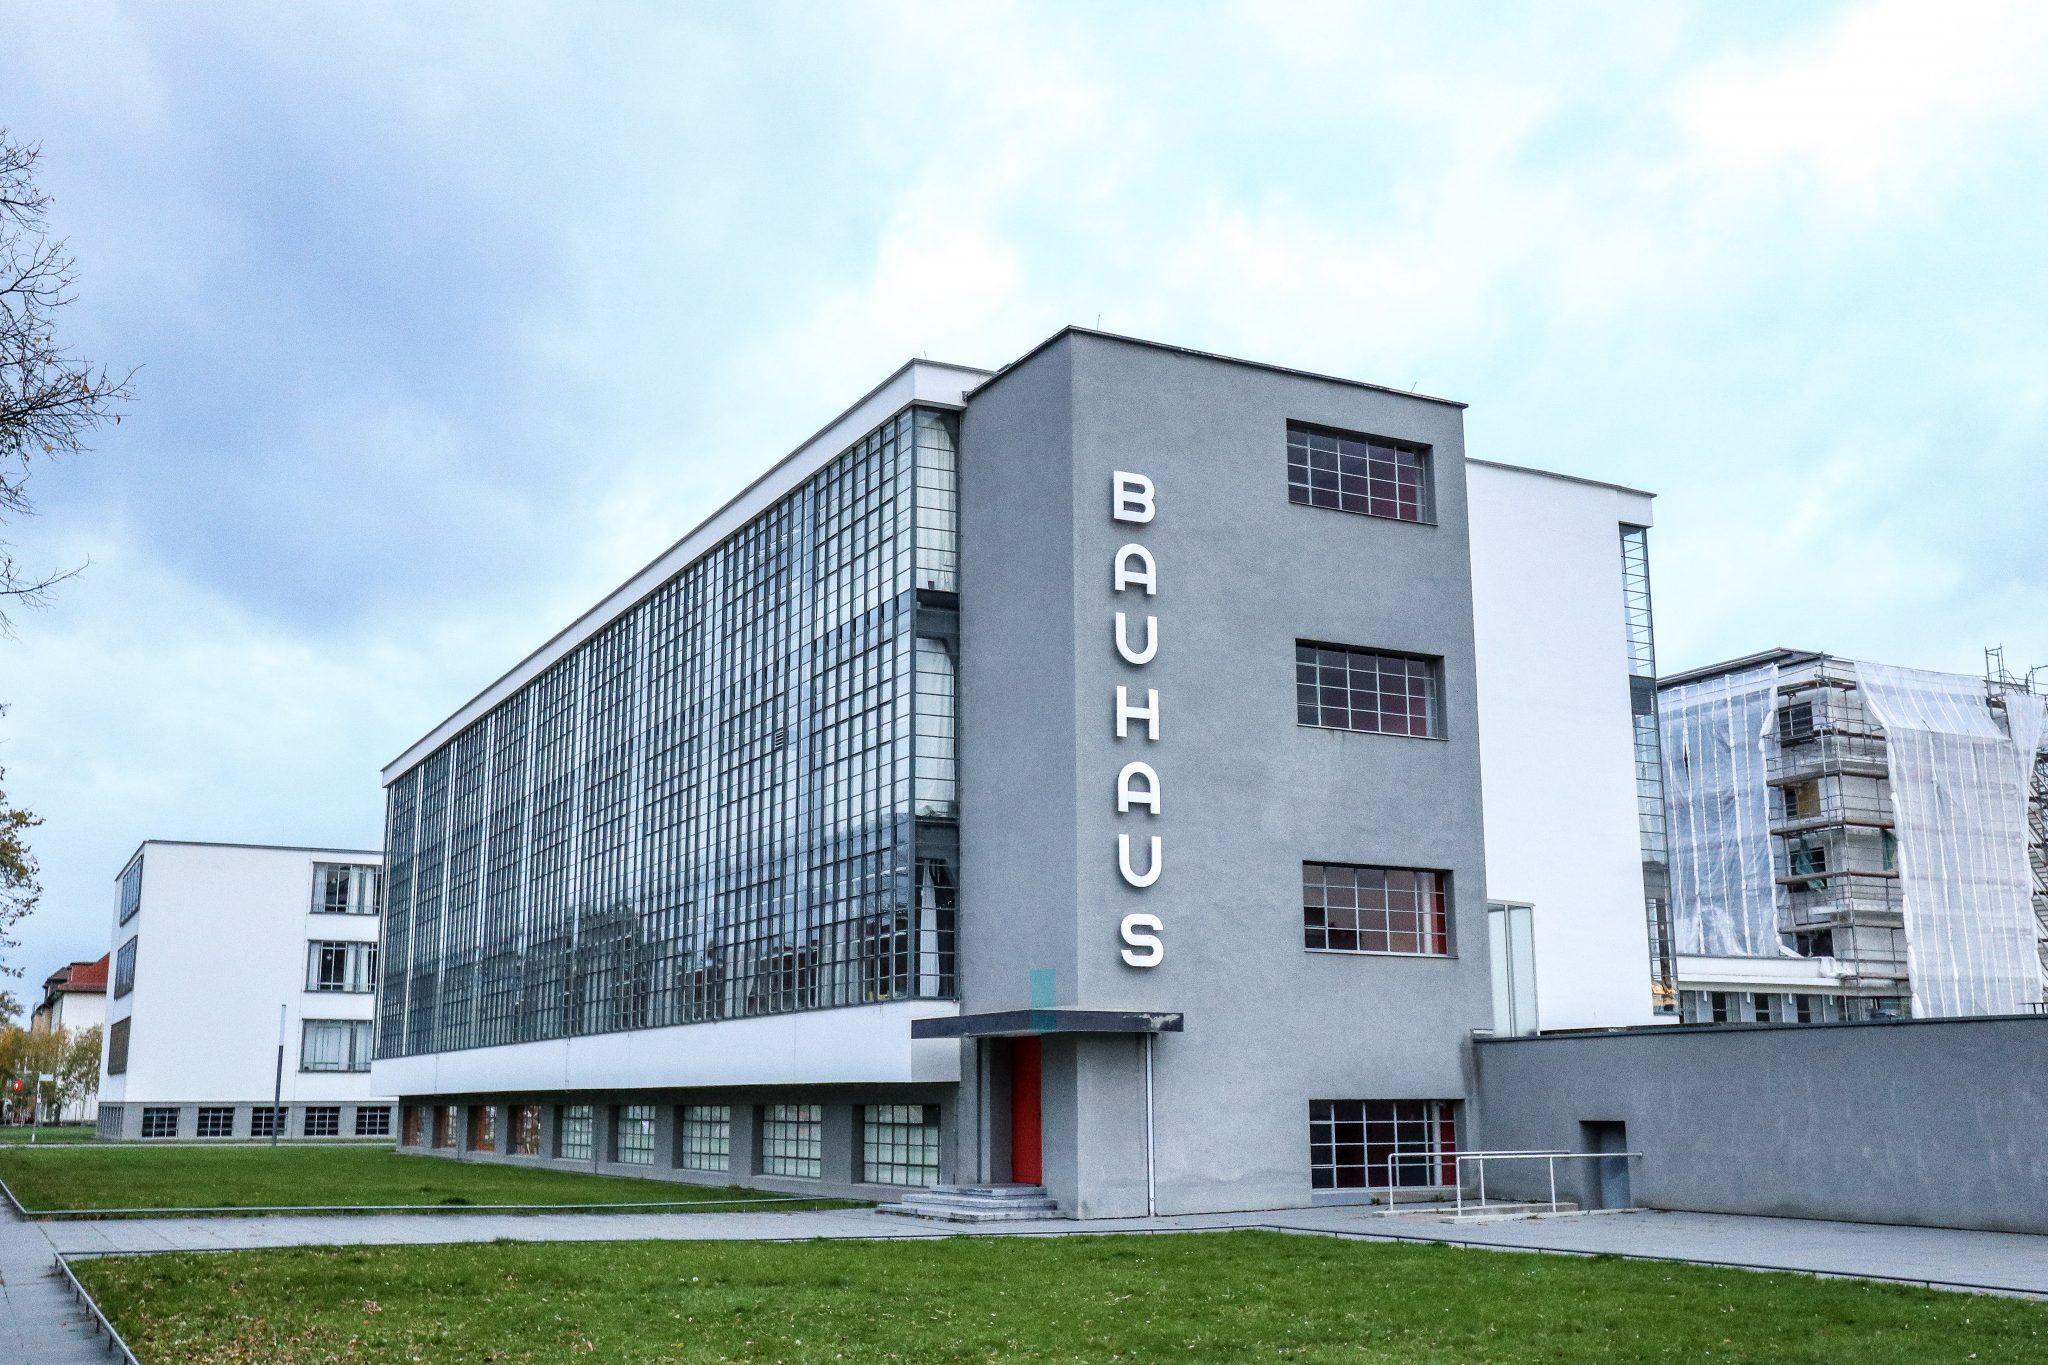 Bauhaus Building, Dessau, Germany